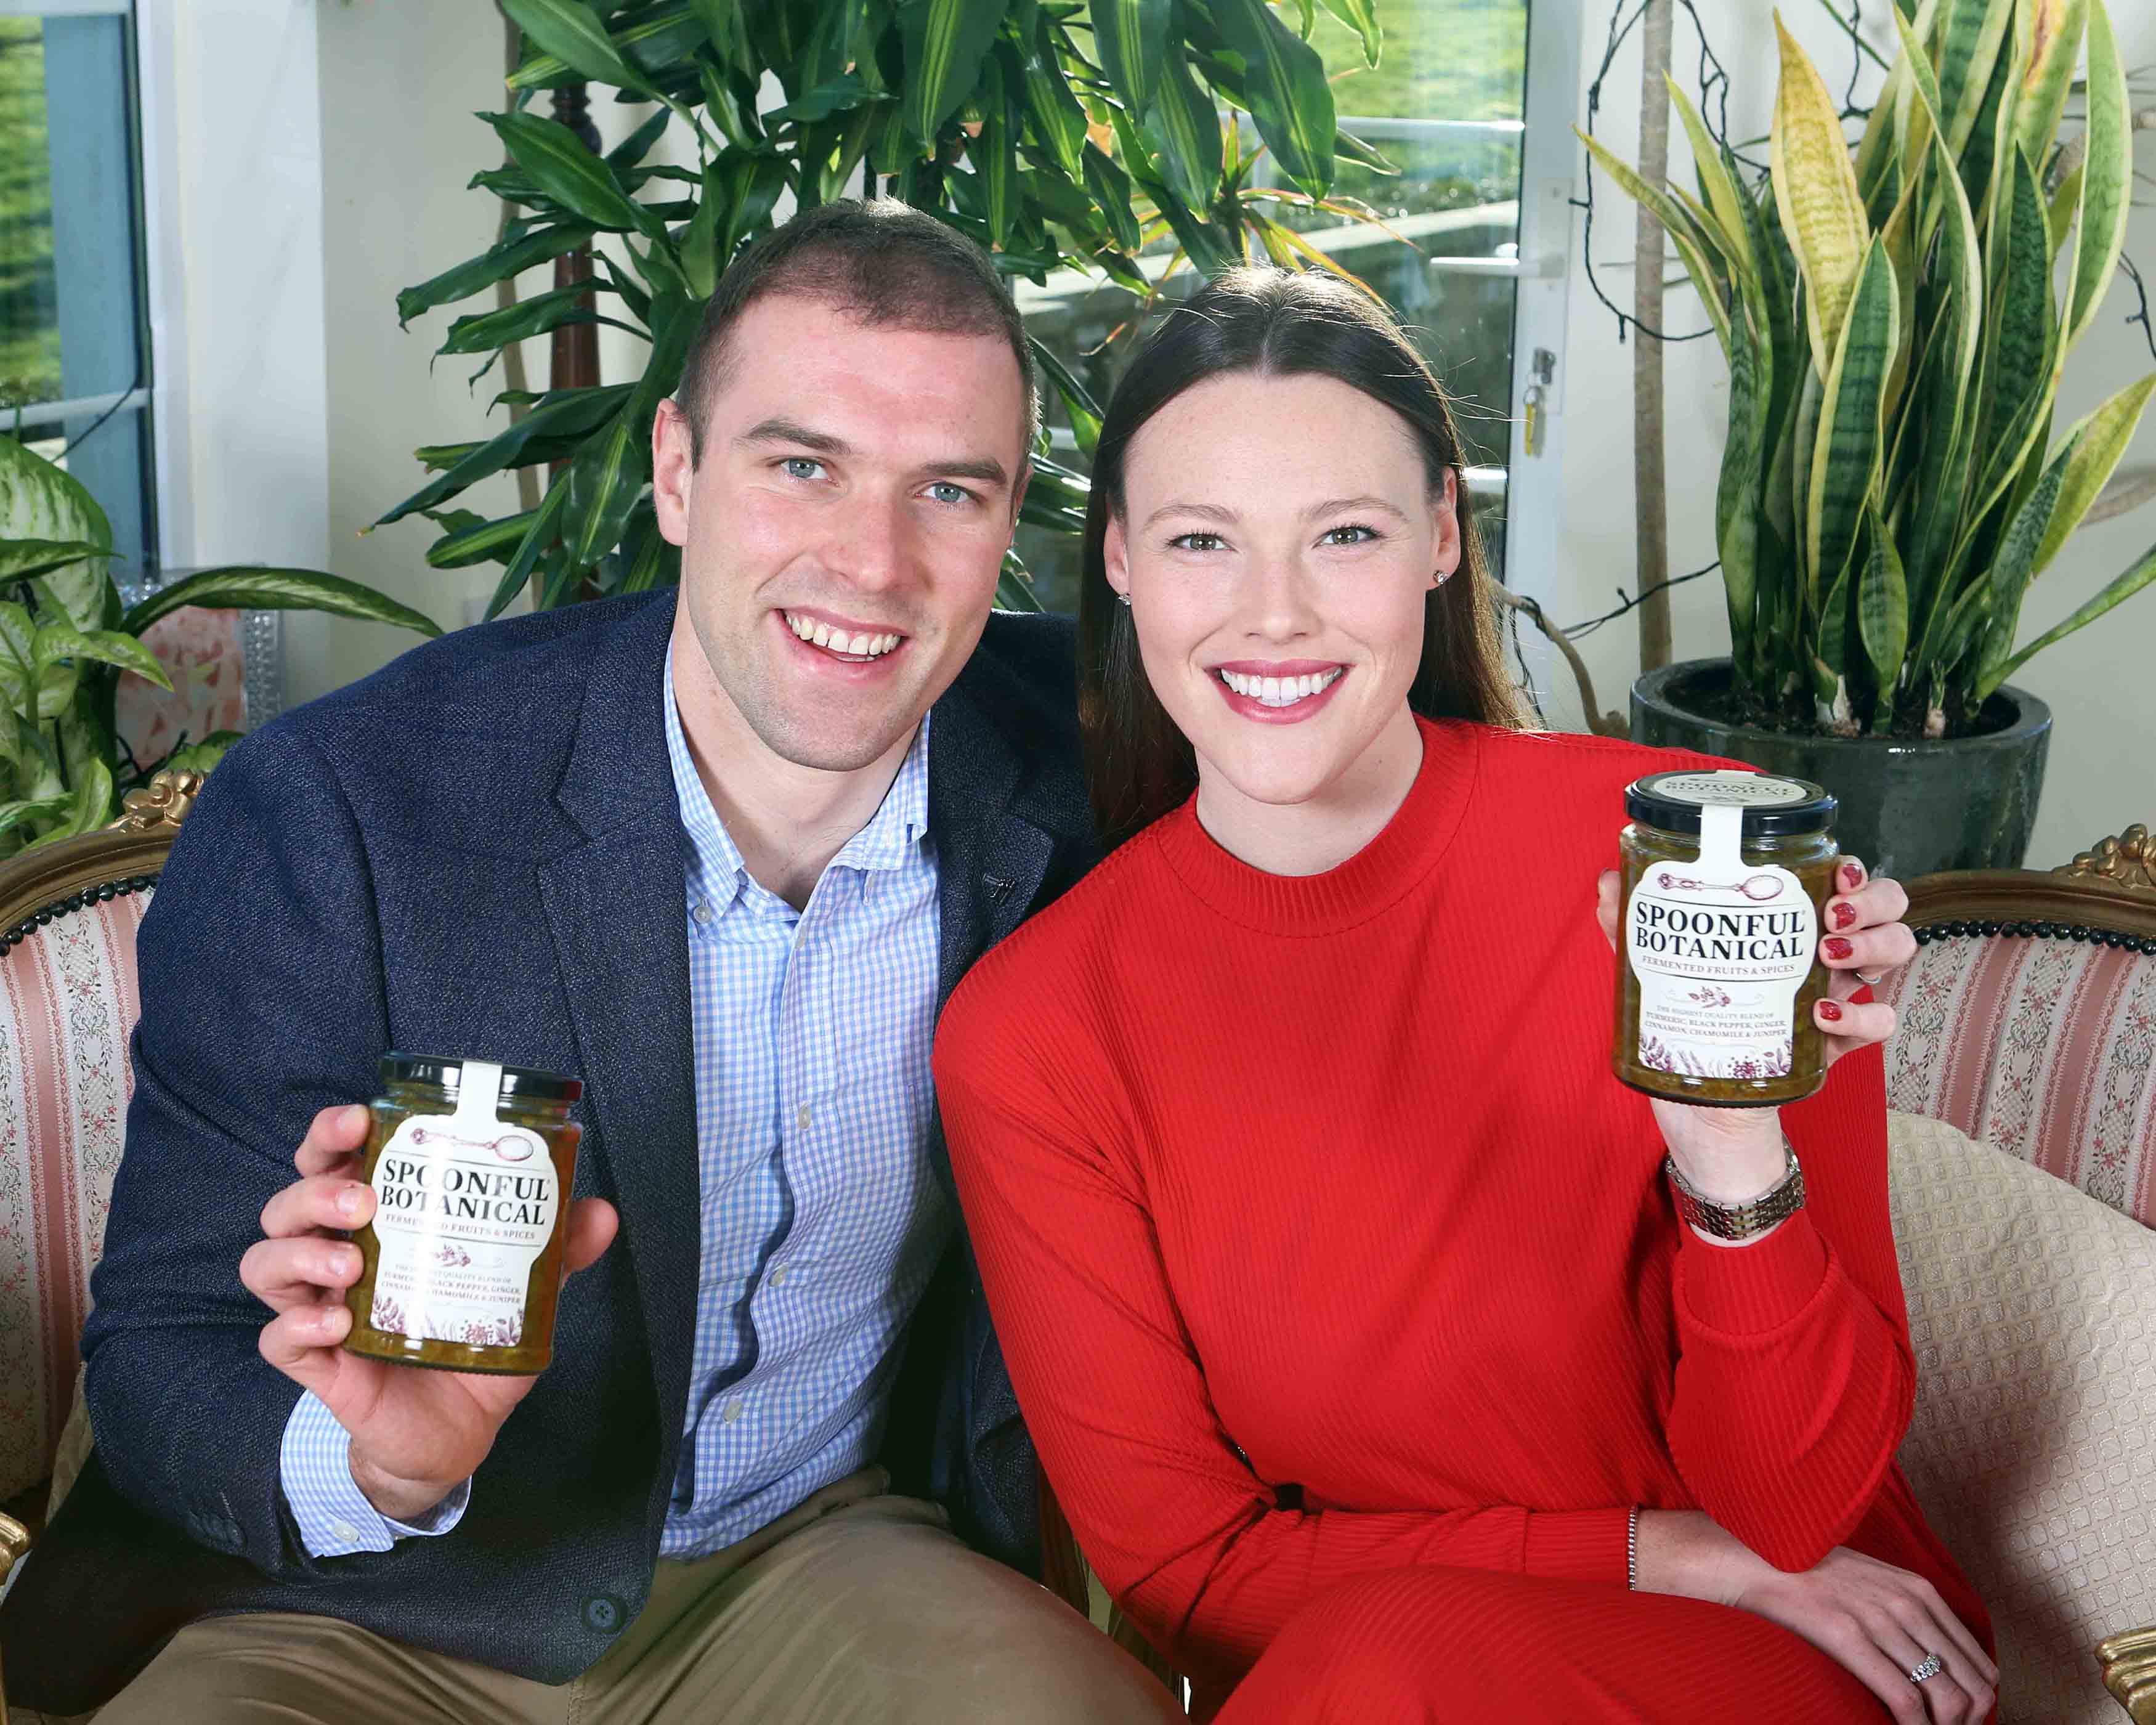 Spoonful Botanical, National Enterprise Awards Finalists 2021, Jenny Callanan Photography, Drogheda, Co.Louth